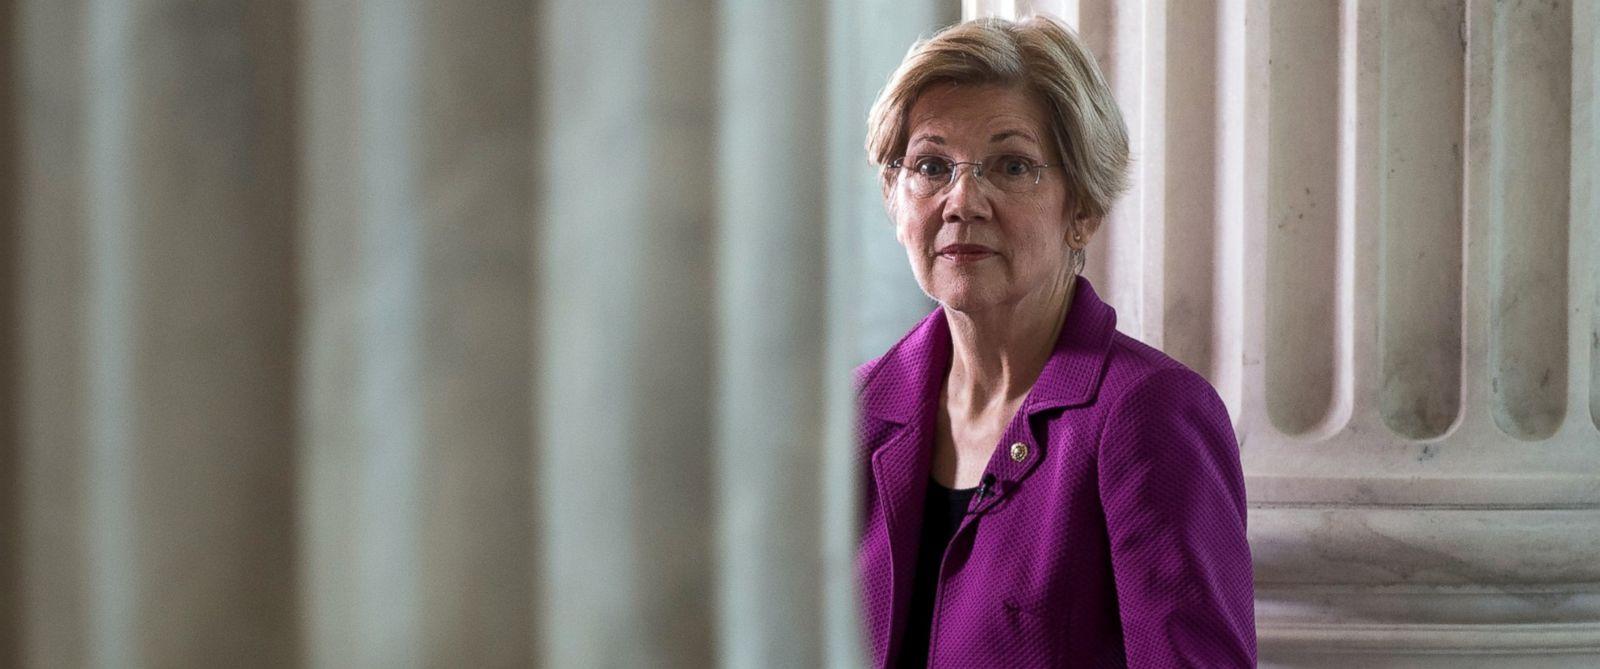 WATCH Elizabeth Warren Makes Huge Announcement About 2020 Presidential Run